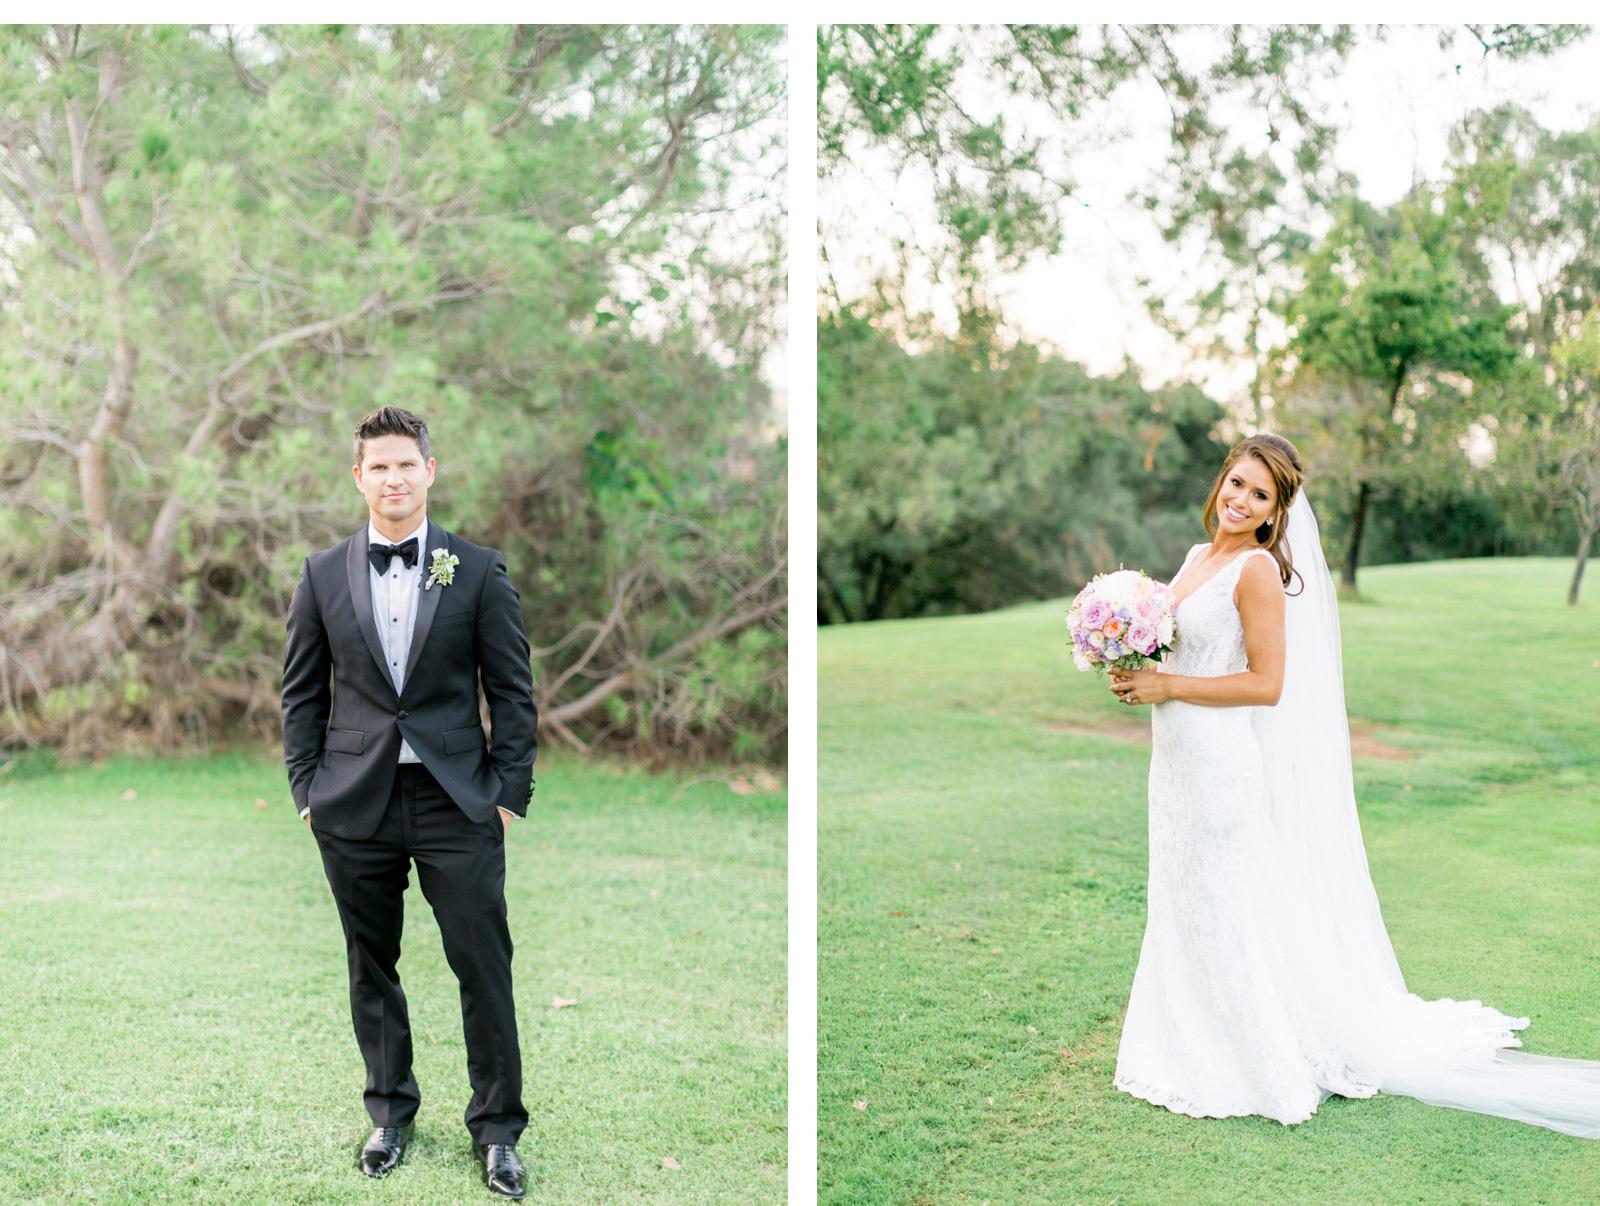 Daniel-and-Nia-Booko-Wedding_05.jpg